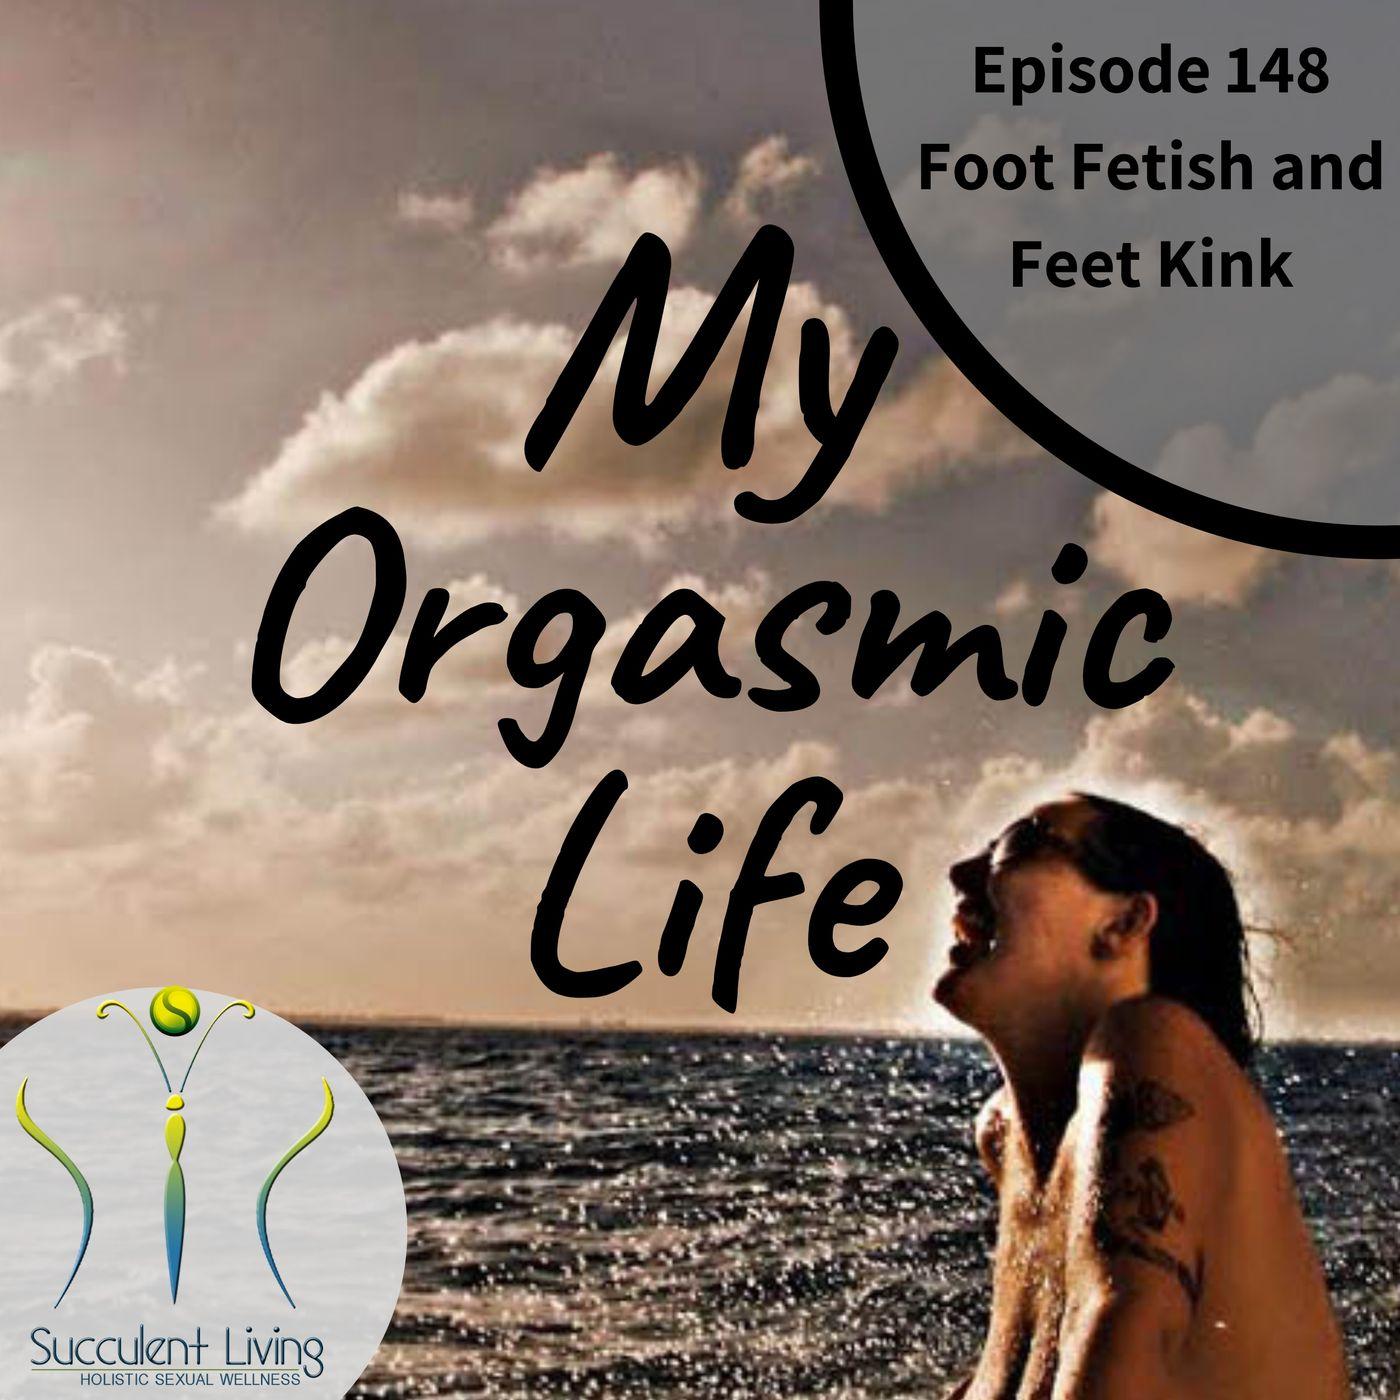 My Orgasmic Life - Feet Kink and Foot Fetish EP 148